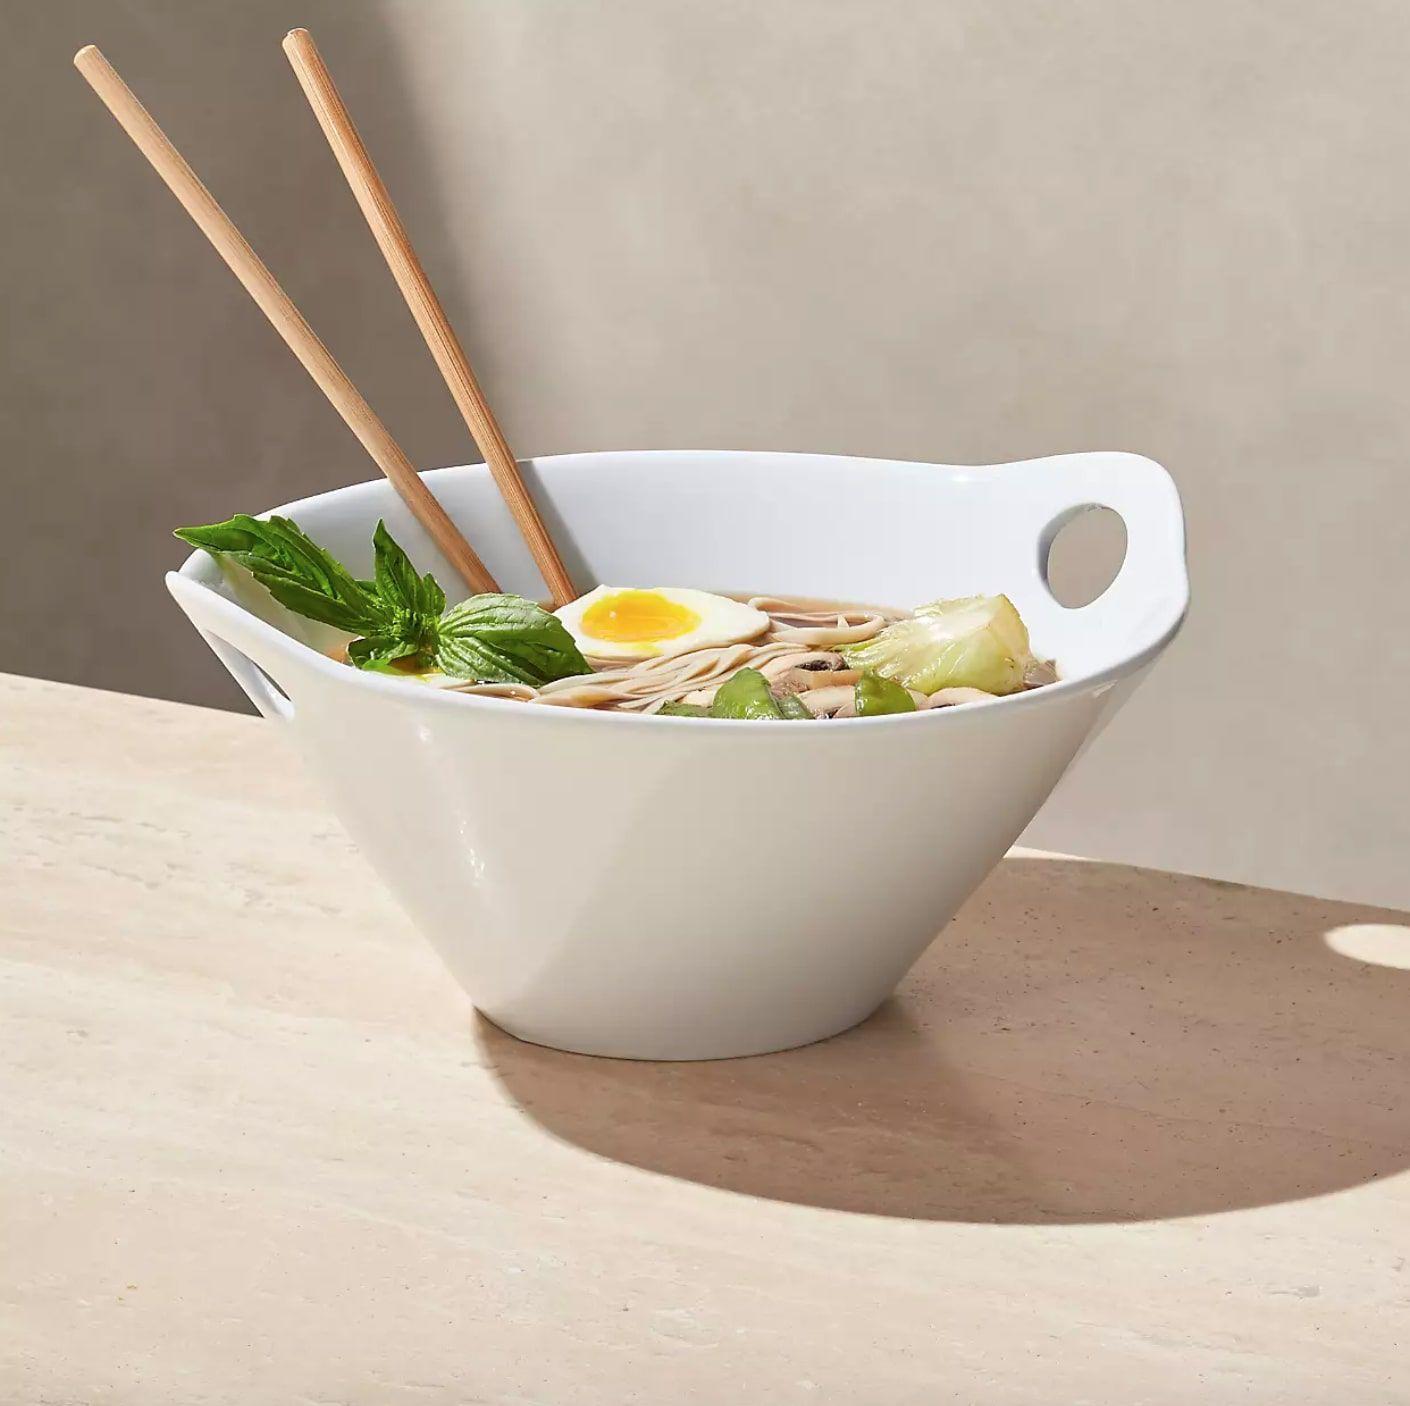 crate-and-barrel-11-inch-kai-noodle-bowl-chopsticks